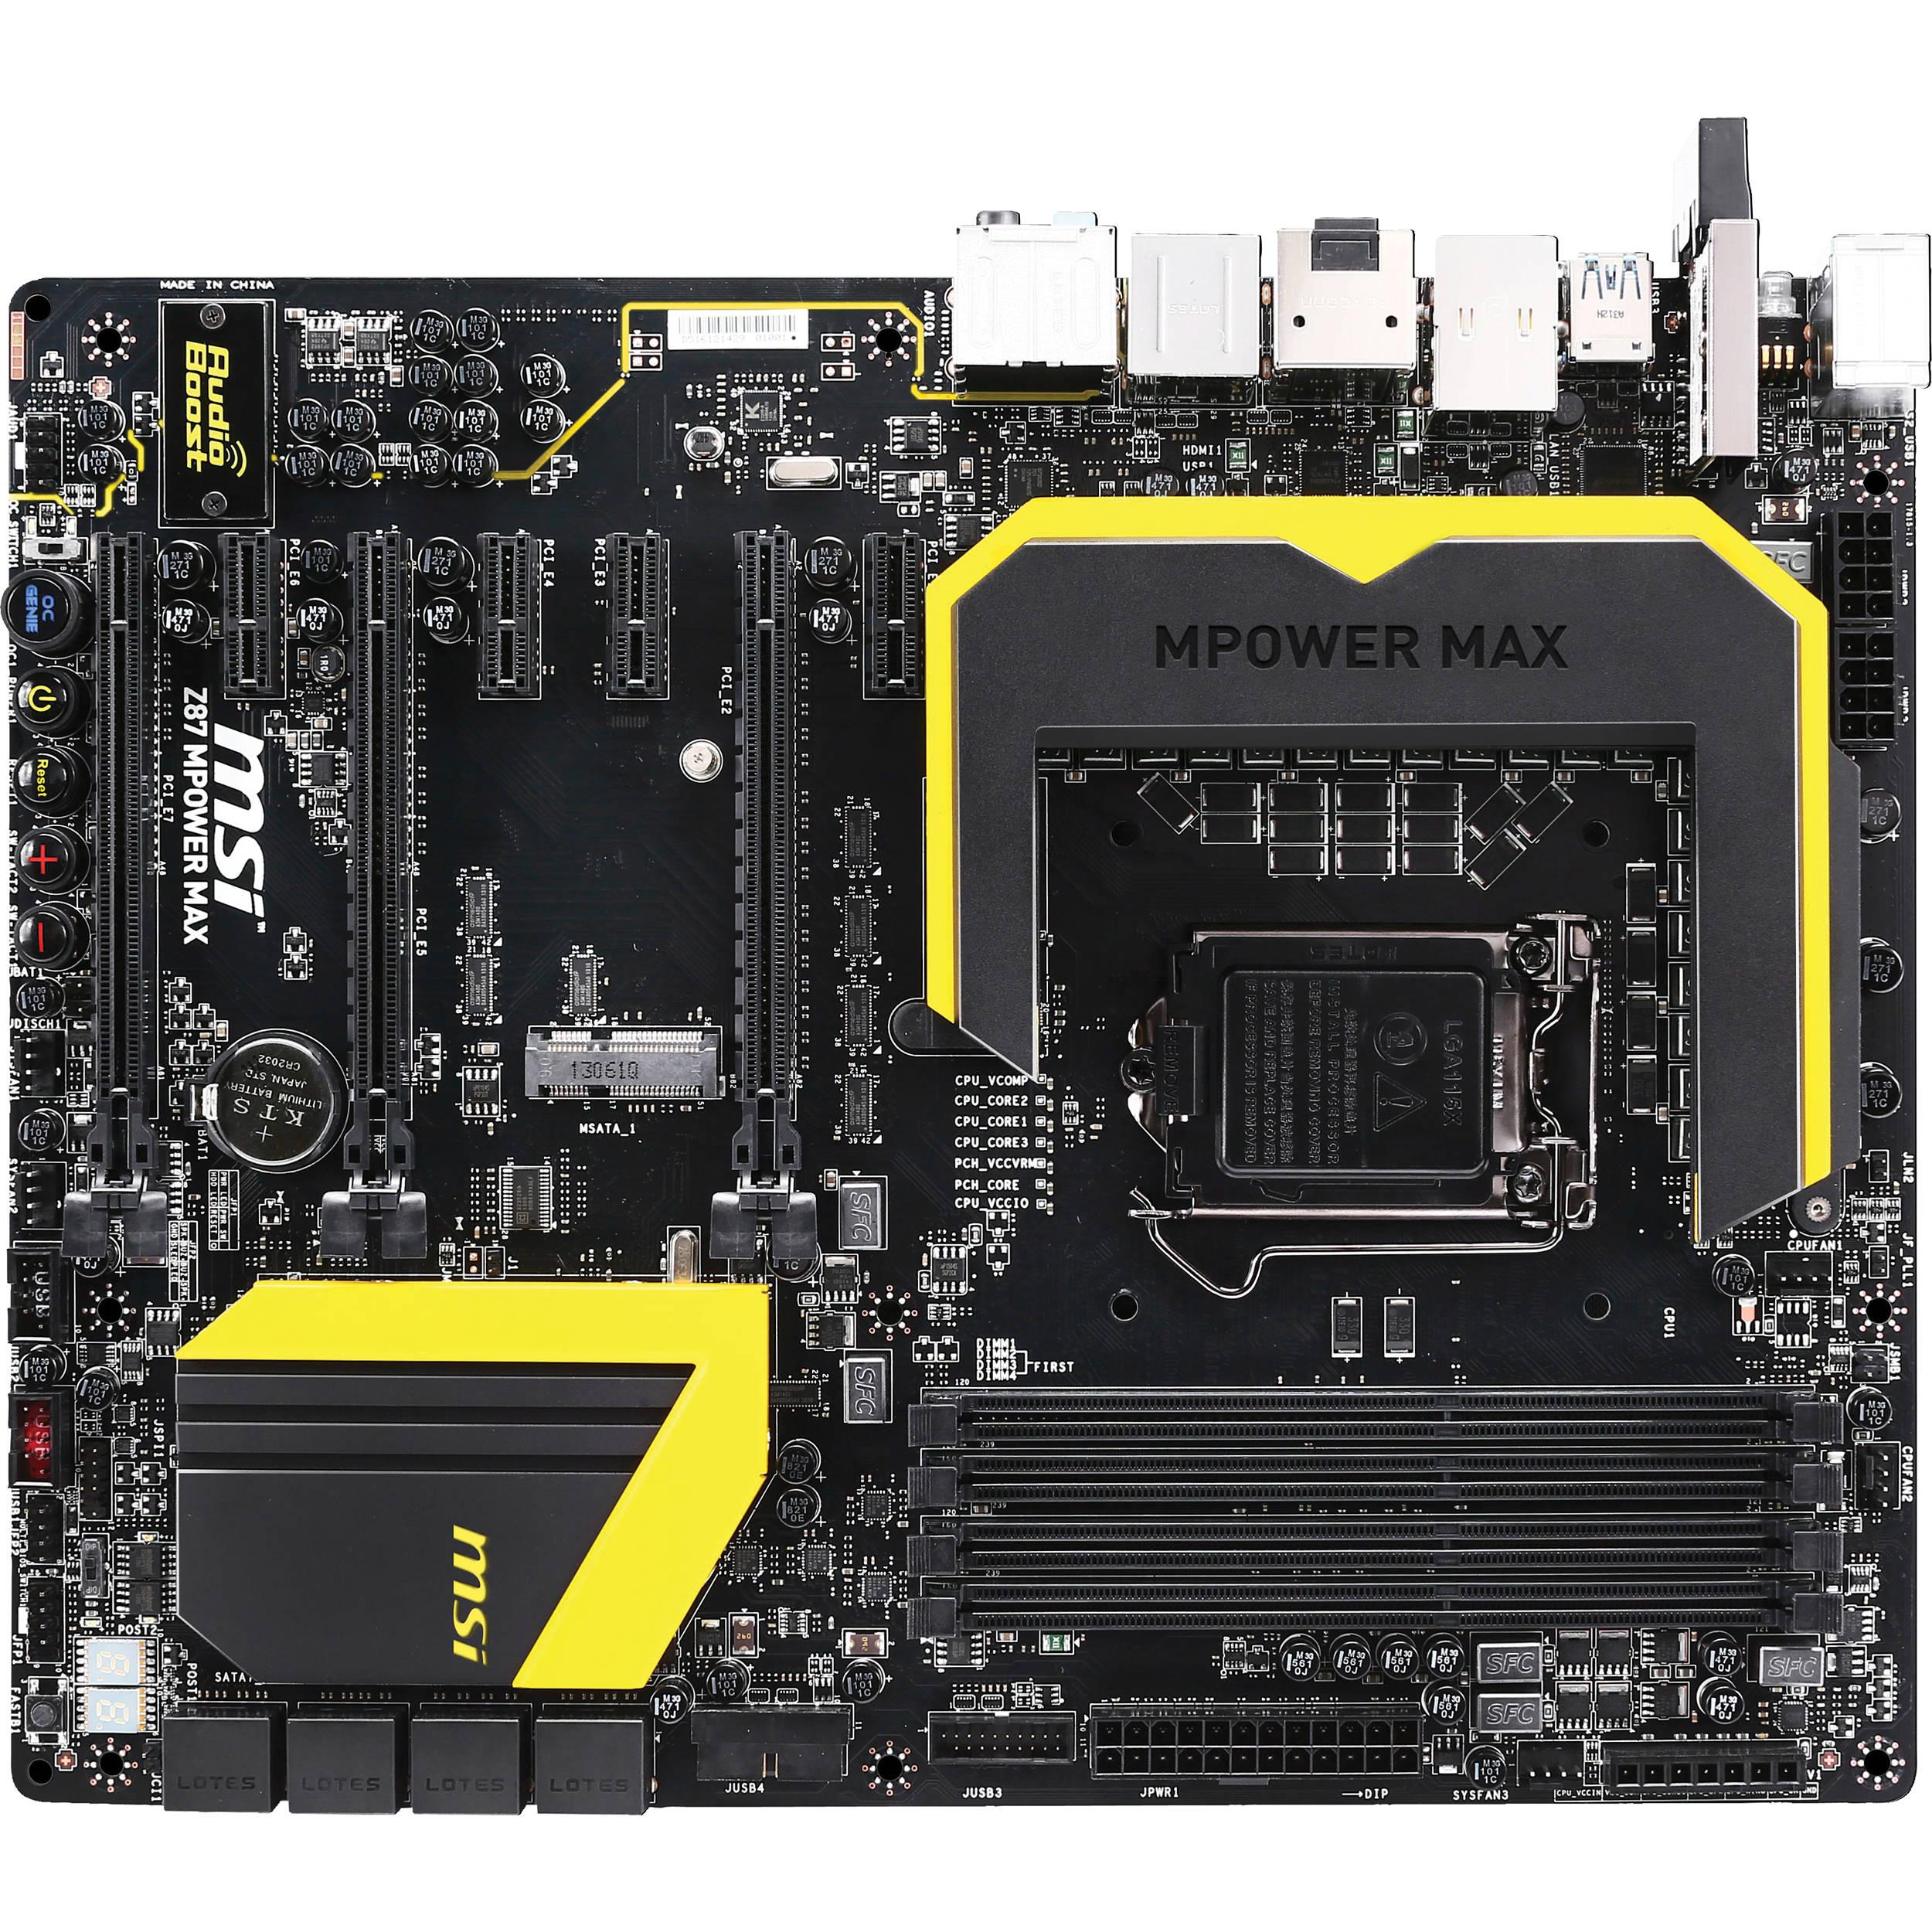 MSI Z87 MPOWER MAX Lucid Virtu MVP Graphics Drivers Windows 7